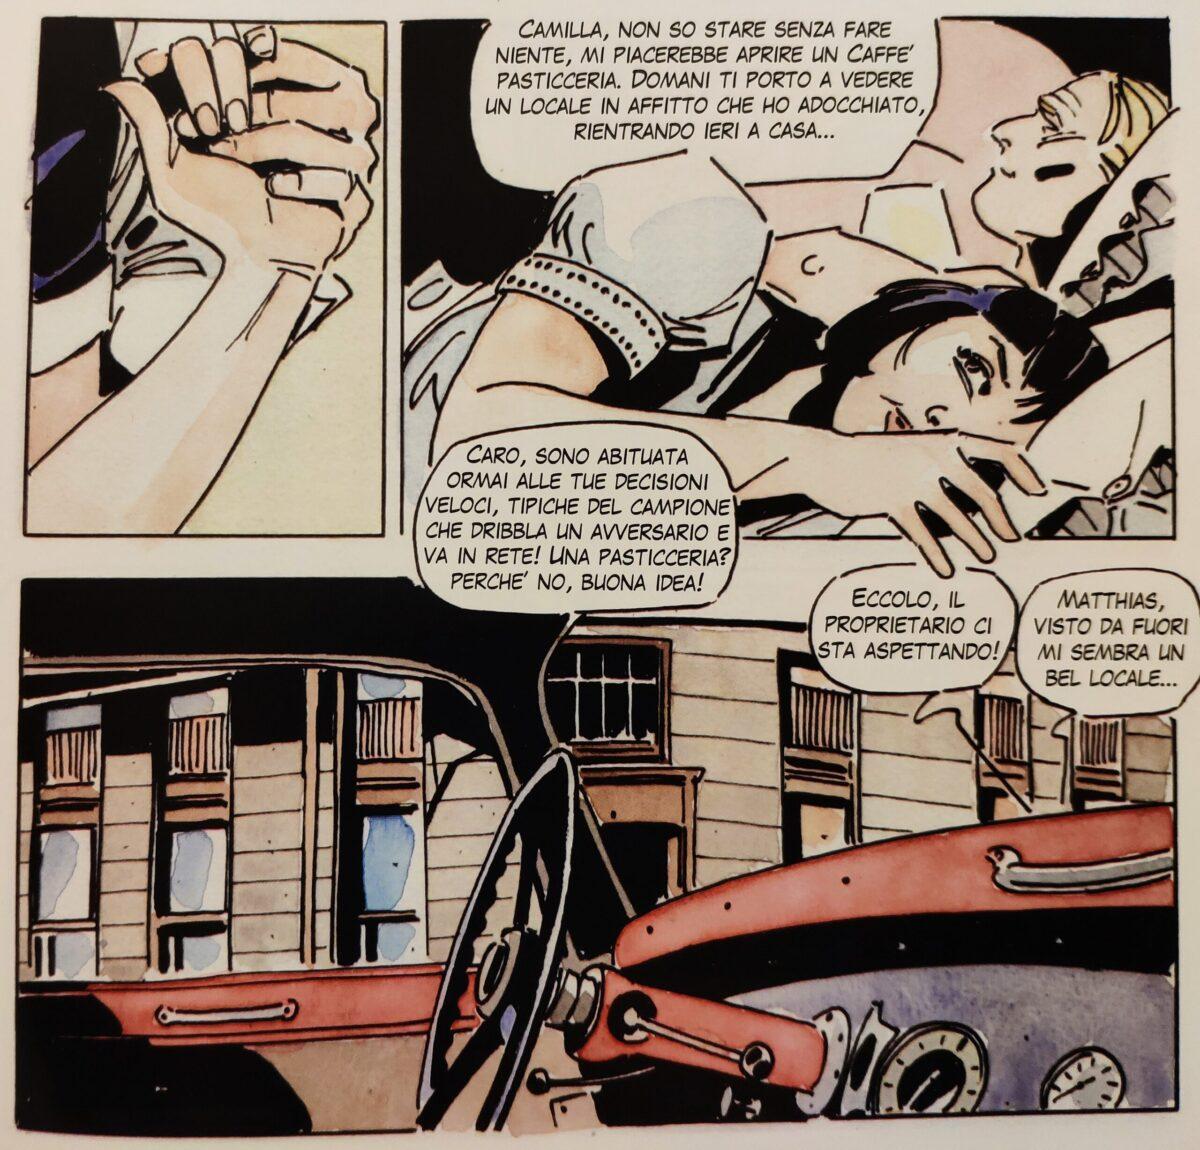 Mio caro fumetto... - L'acquisto del Café Annahof, poi Café Matthias Sindelar